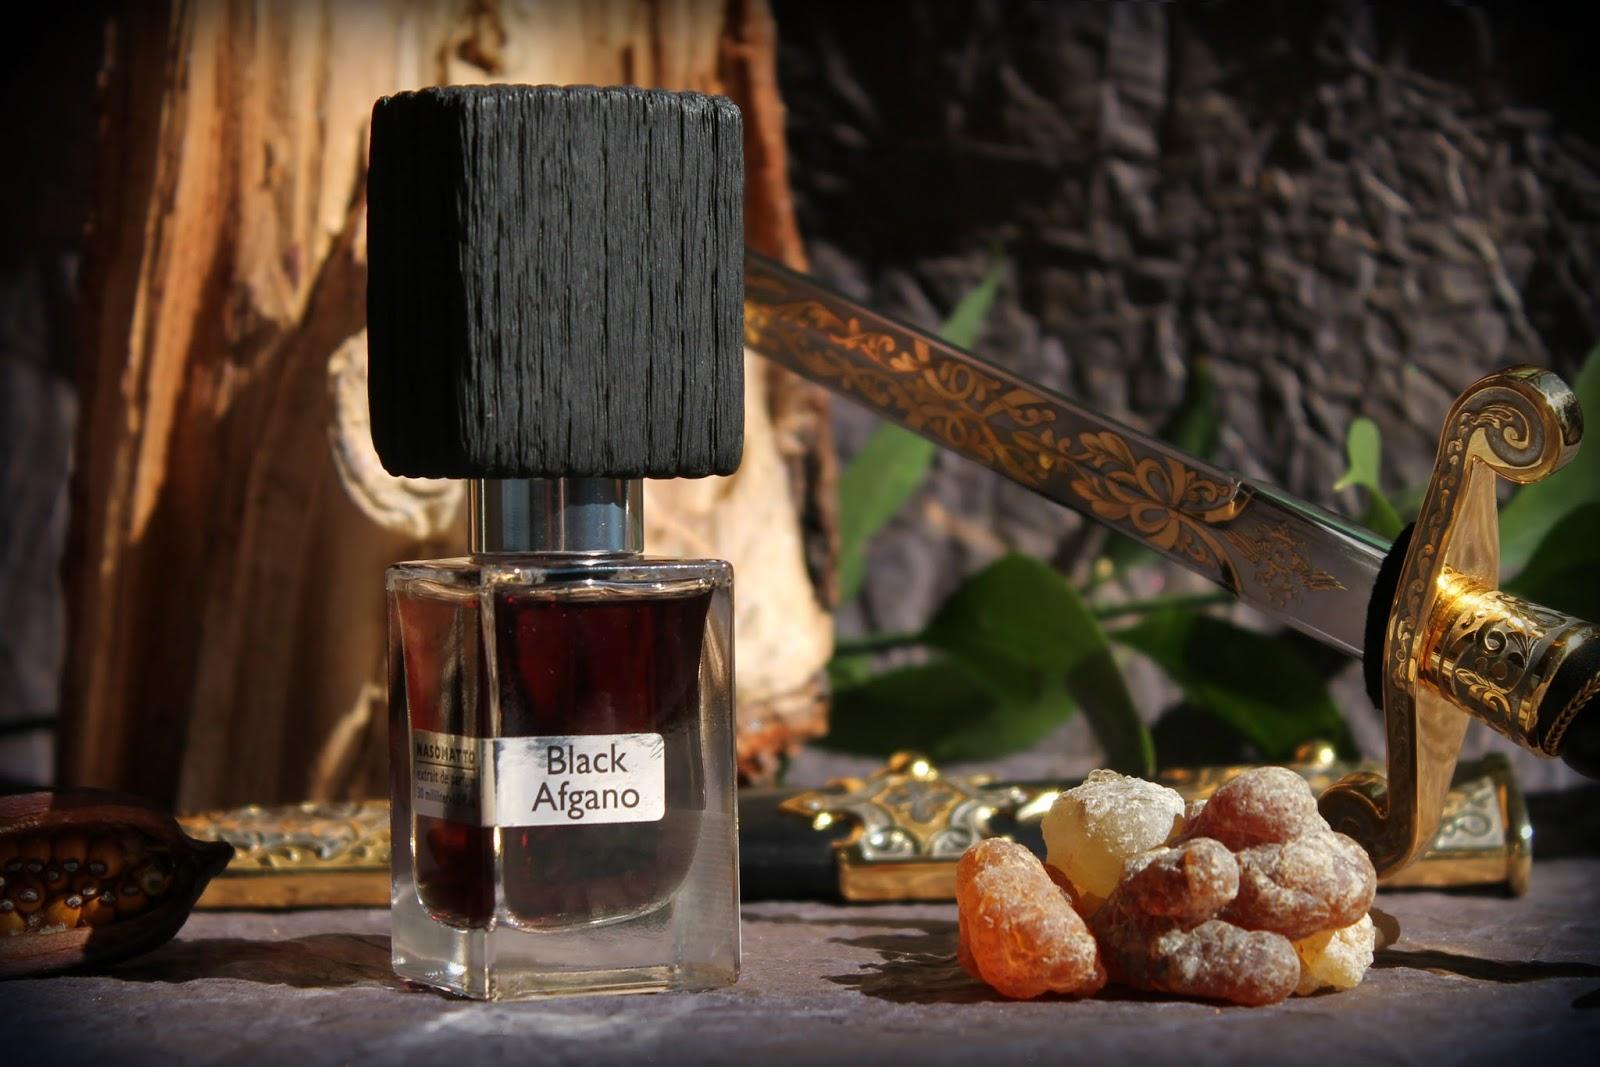 Beauty Unearthly Nasomatto Black Afgano Extrait De Parfum Review